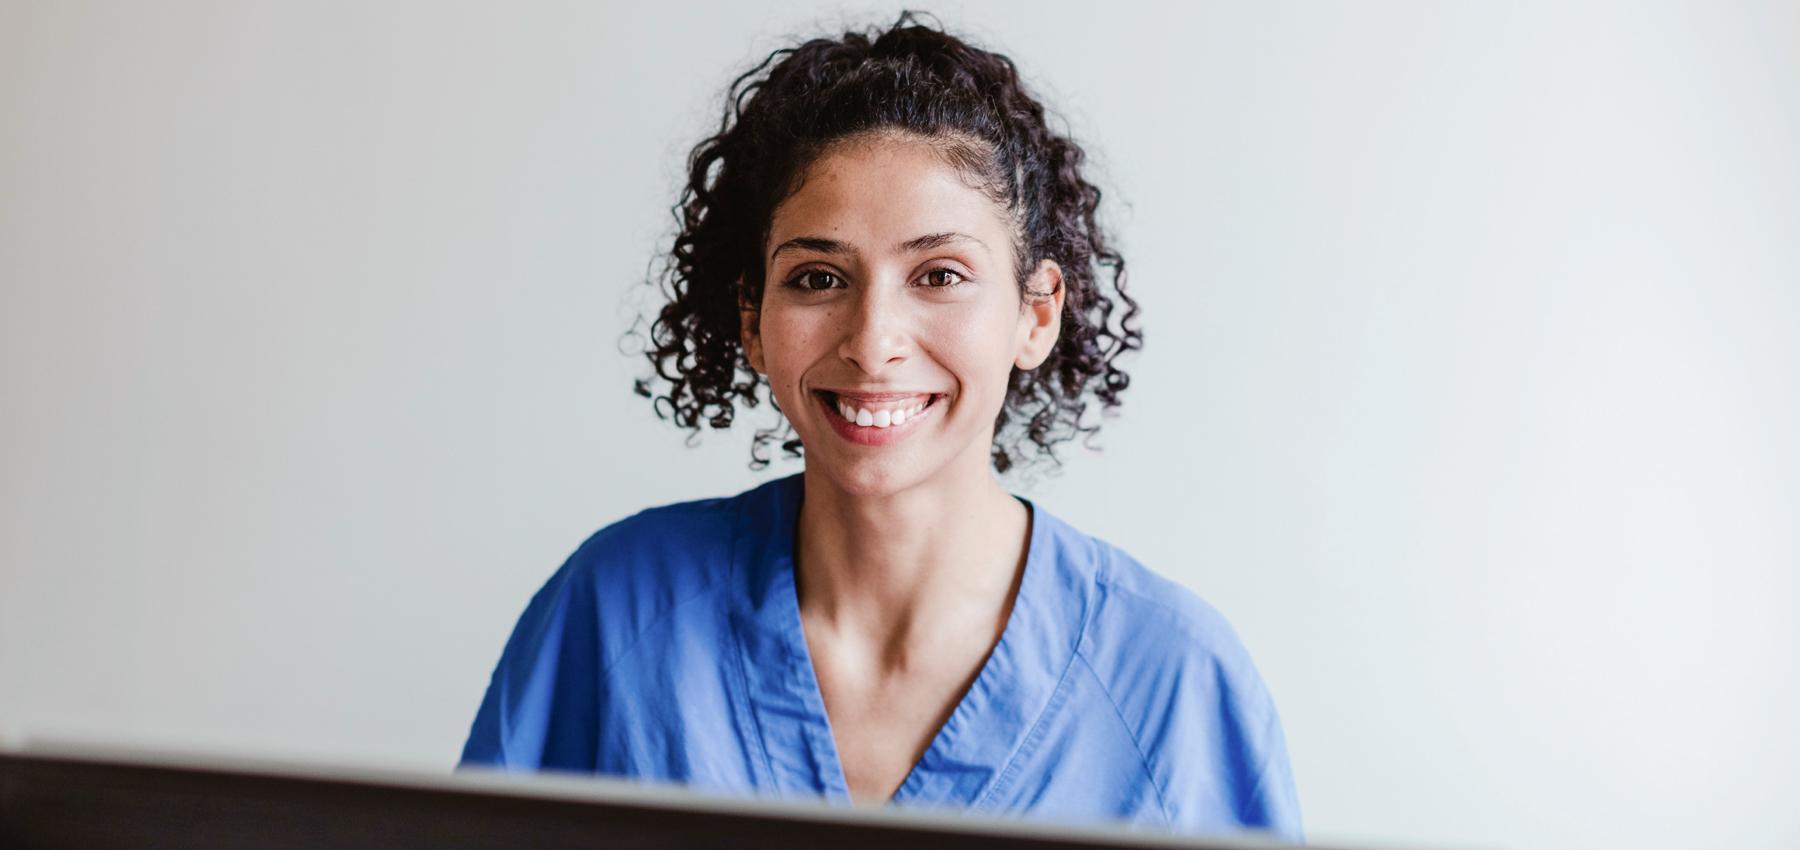 Canada job market analysis: Healthcare